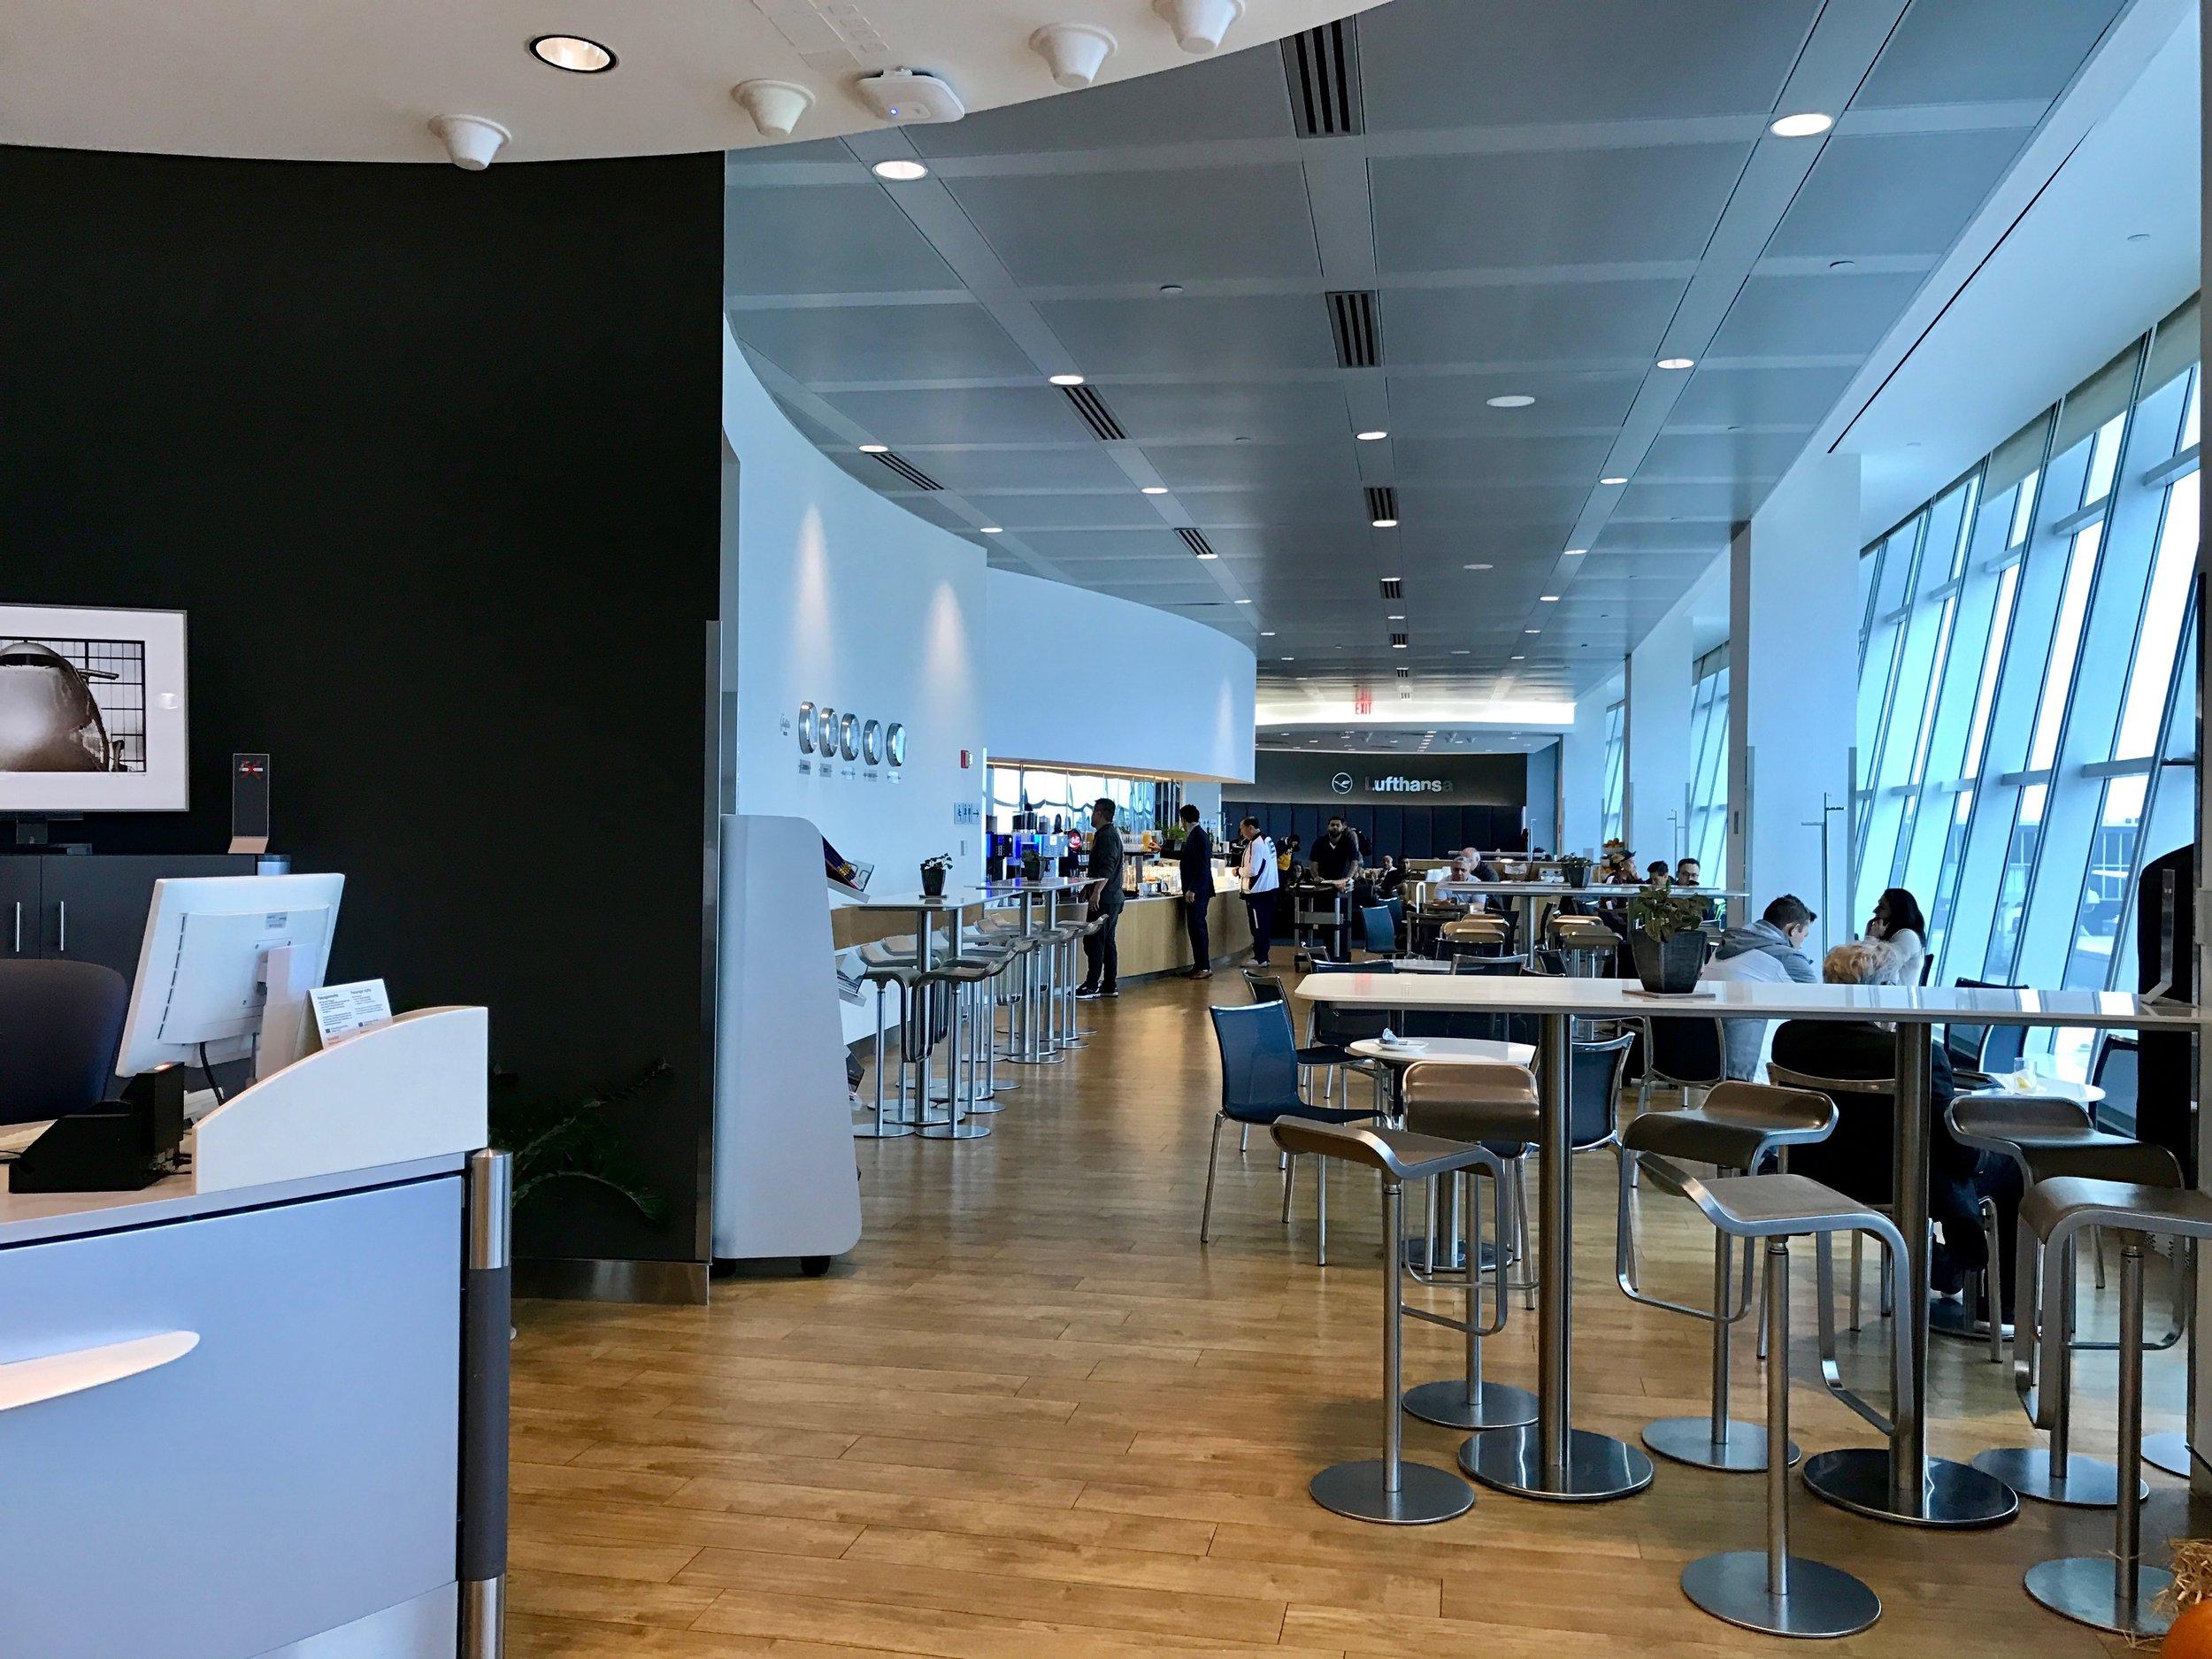 Lufthansa Business Class Lounge at JFK terminal 1